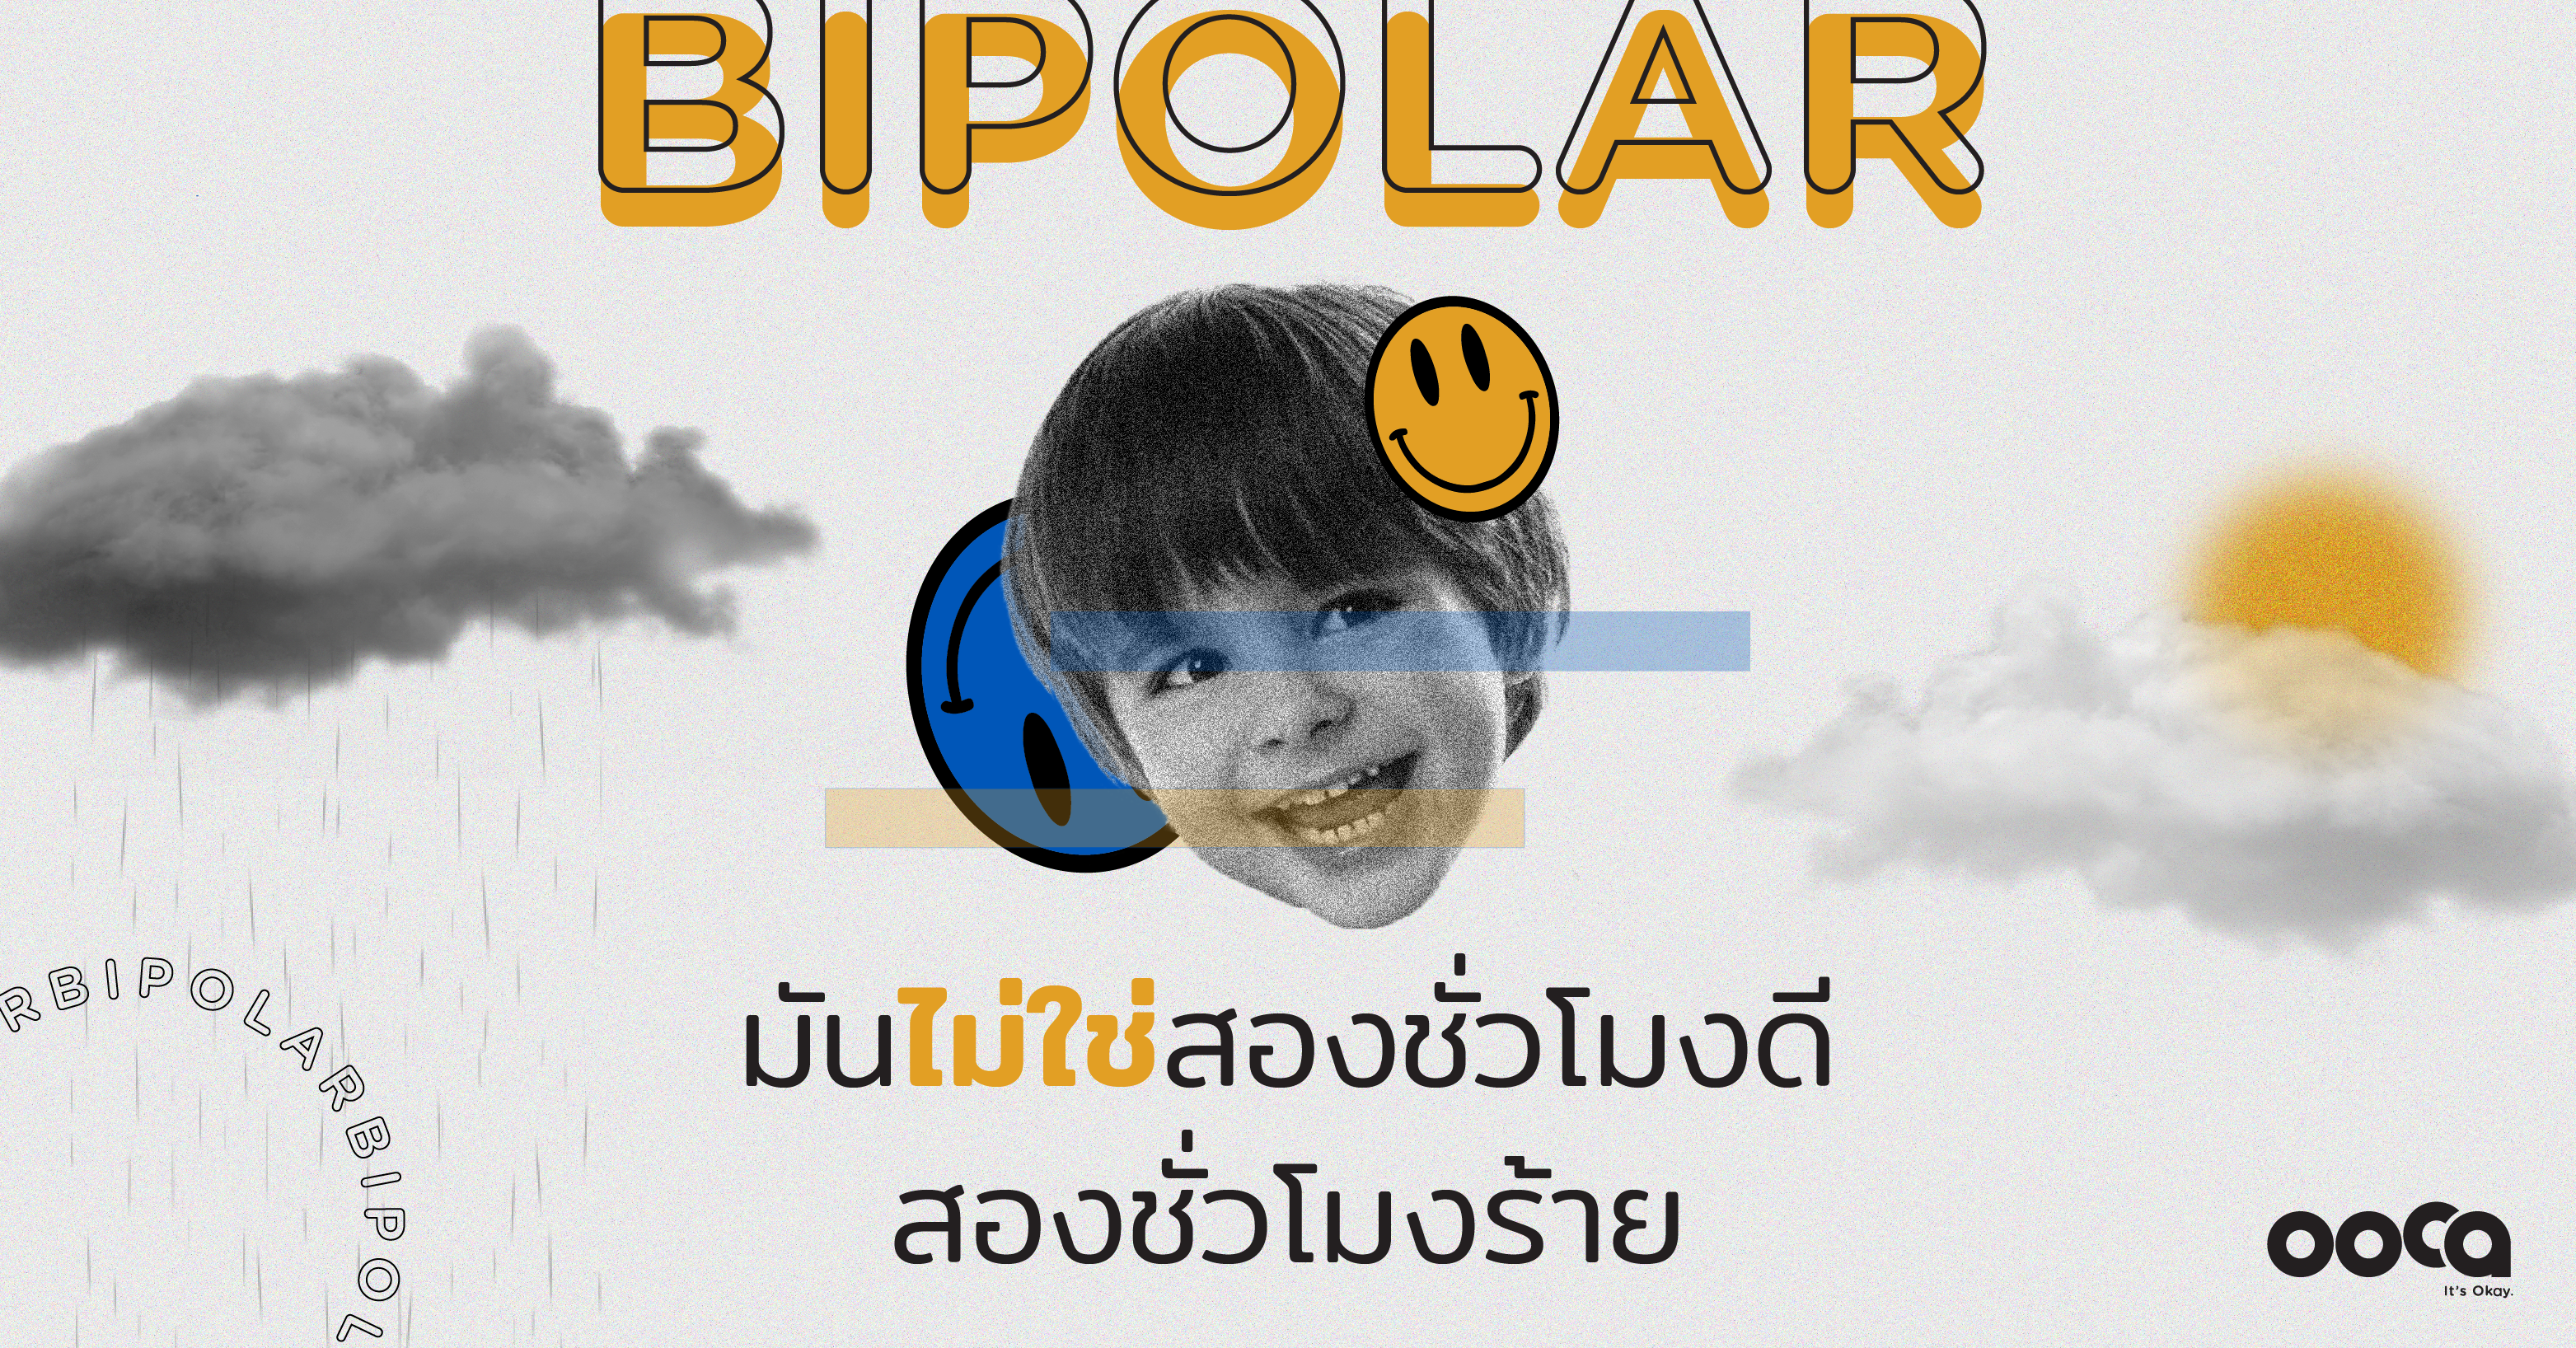 cover bipolar